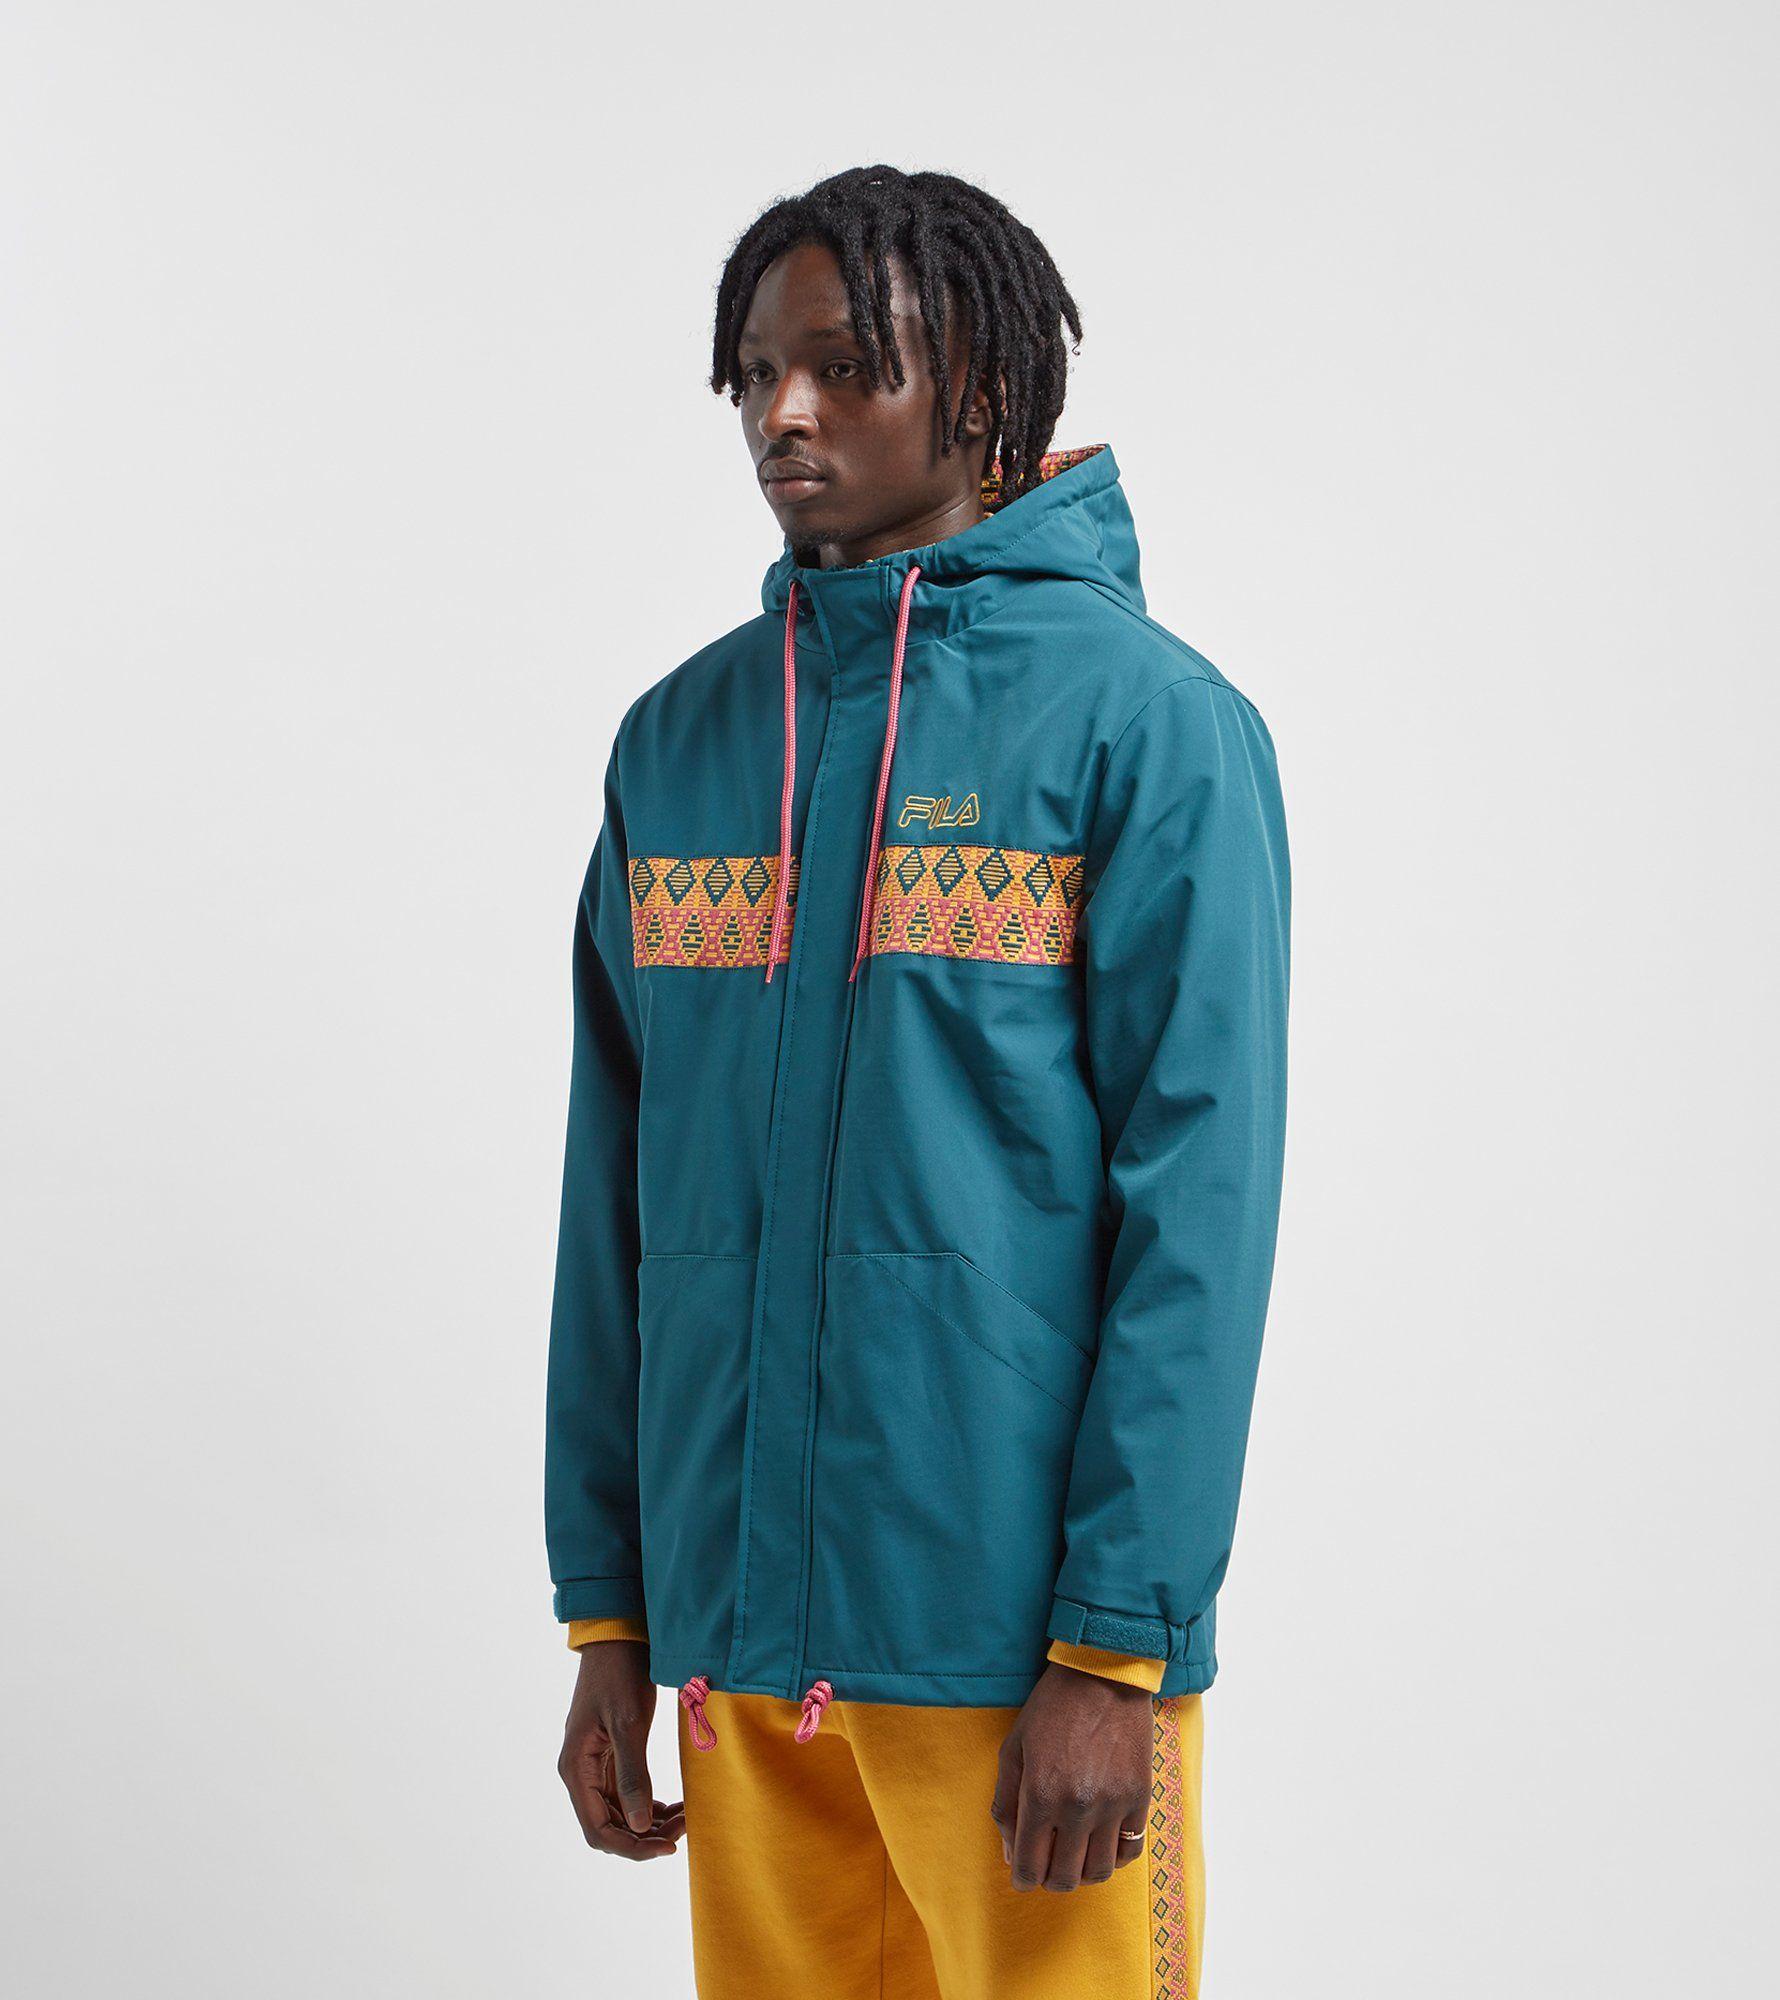 Fila Manaslu Jacket - size? Exclusive